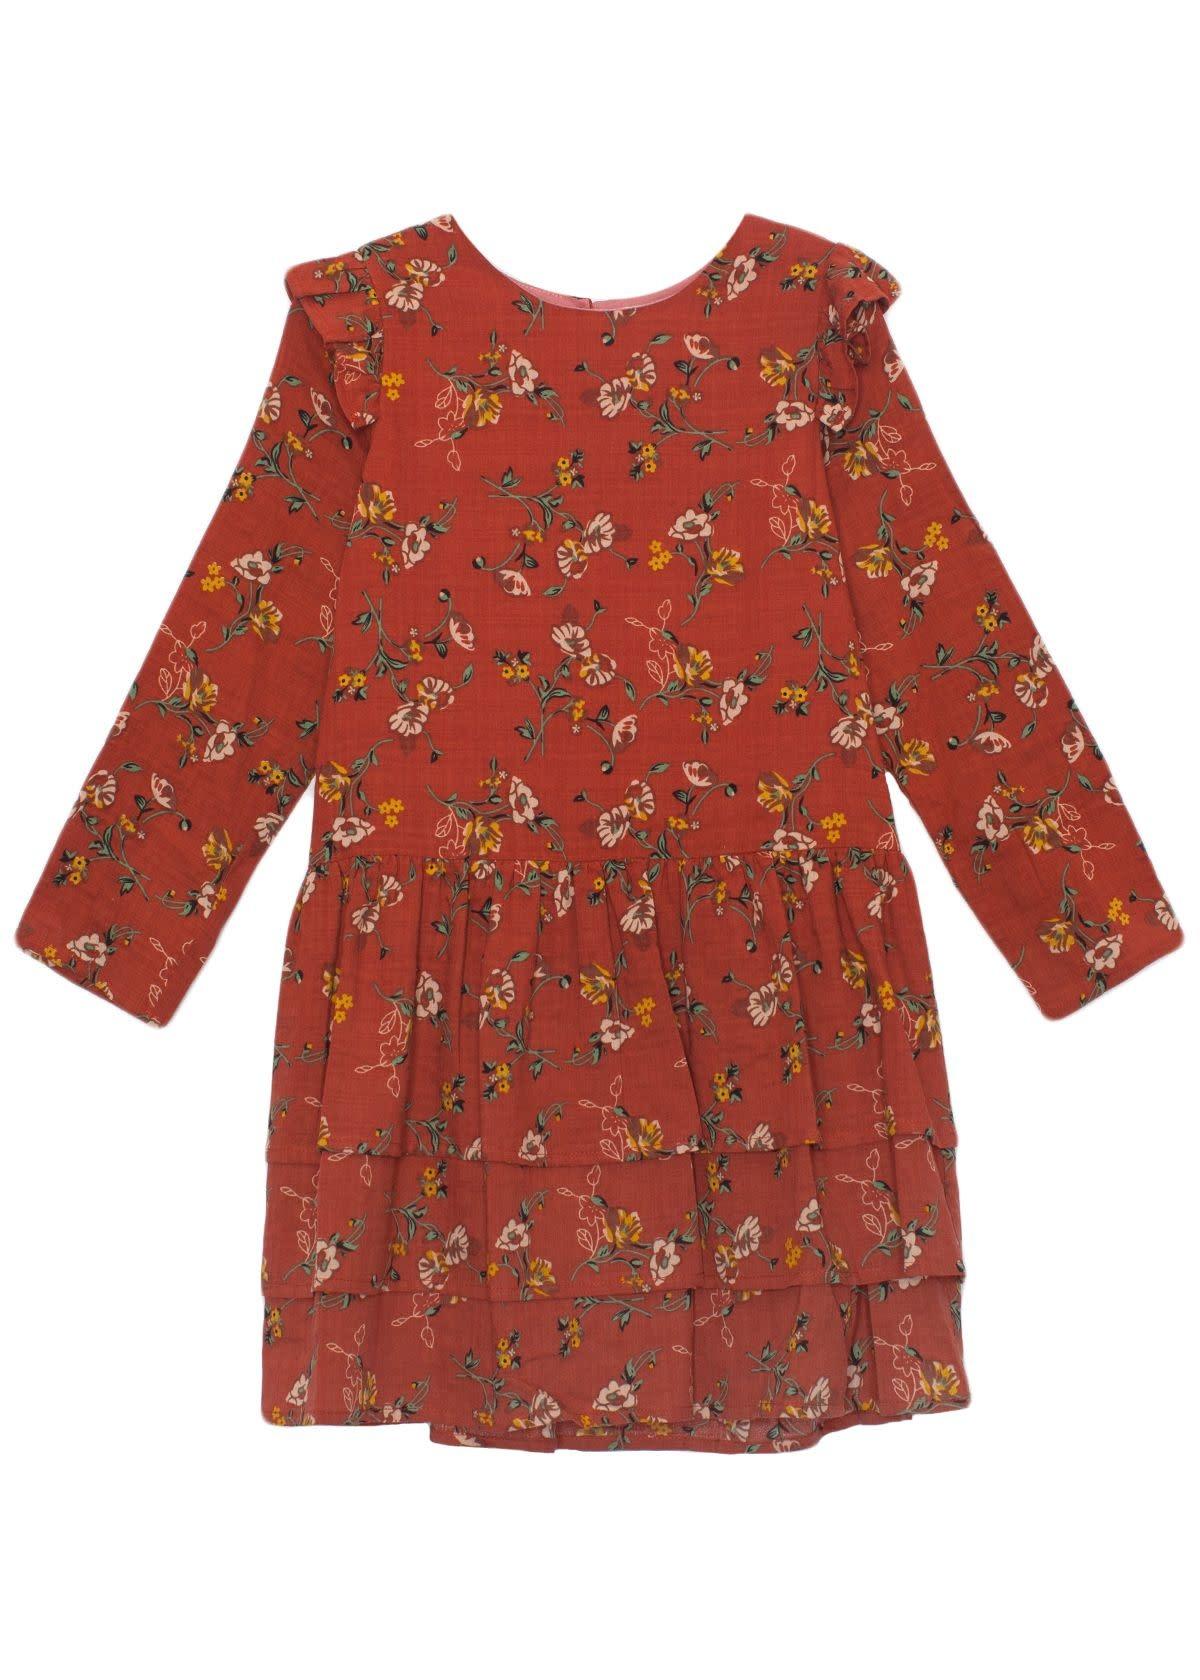 Mabel and Honey Orange Floral Woven Dress